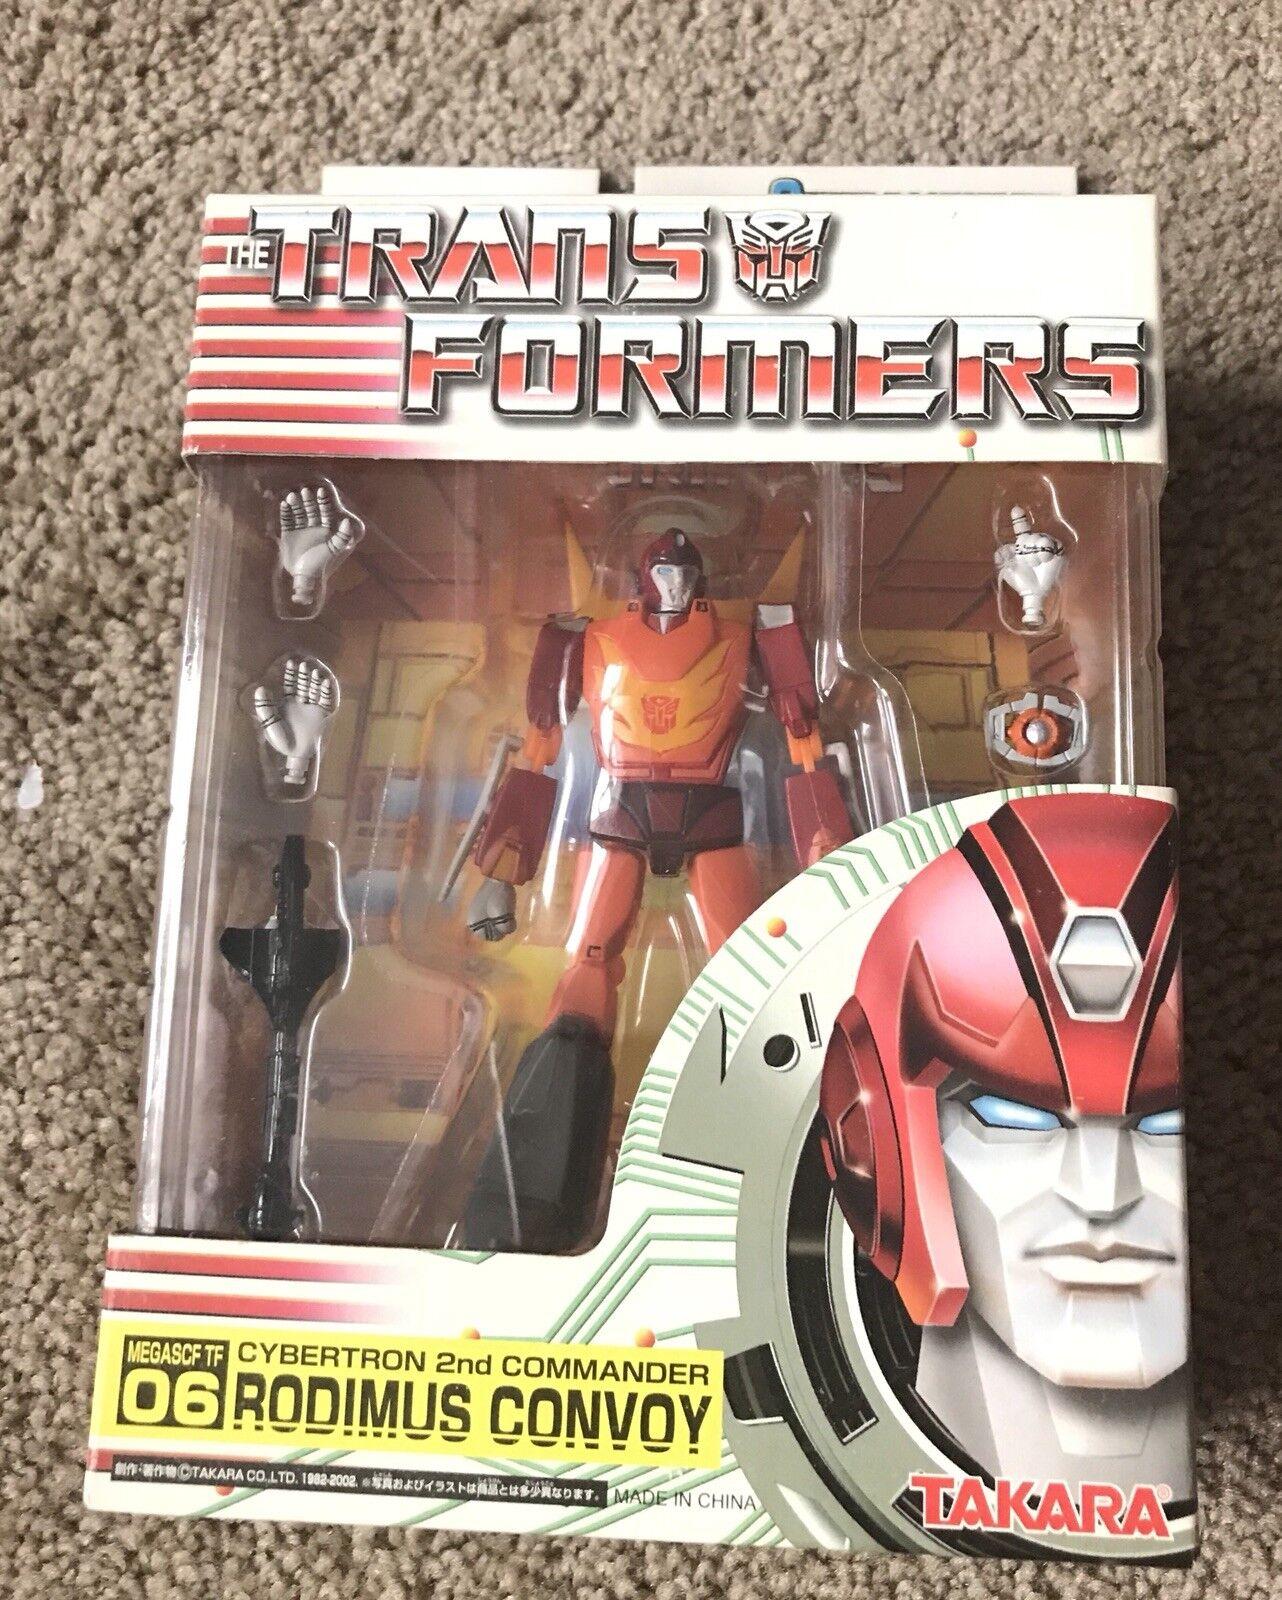 Takara Transformers Rodimus Convoy MEGASCF TF 06 Cybertron 2nd Commander